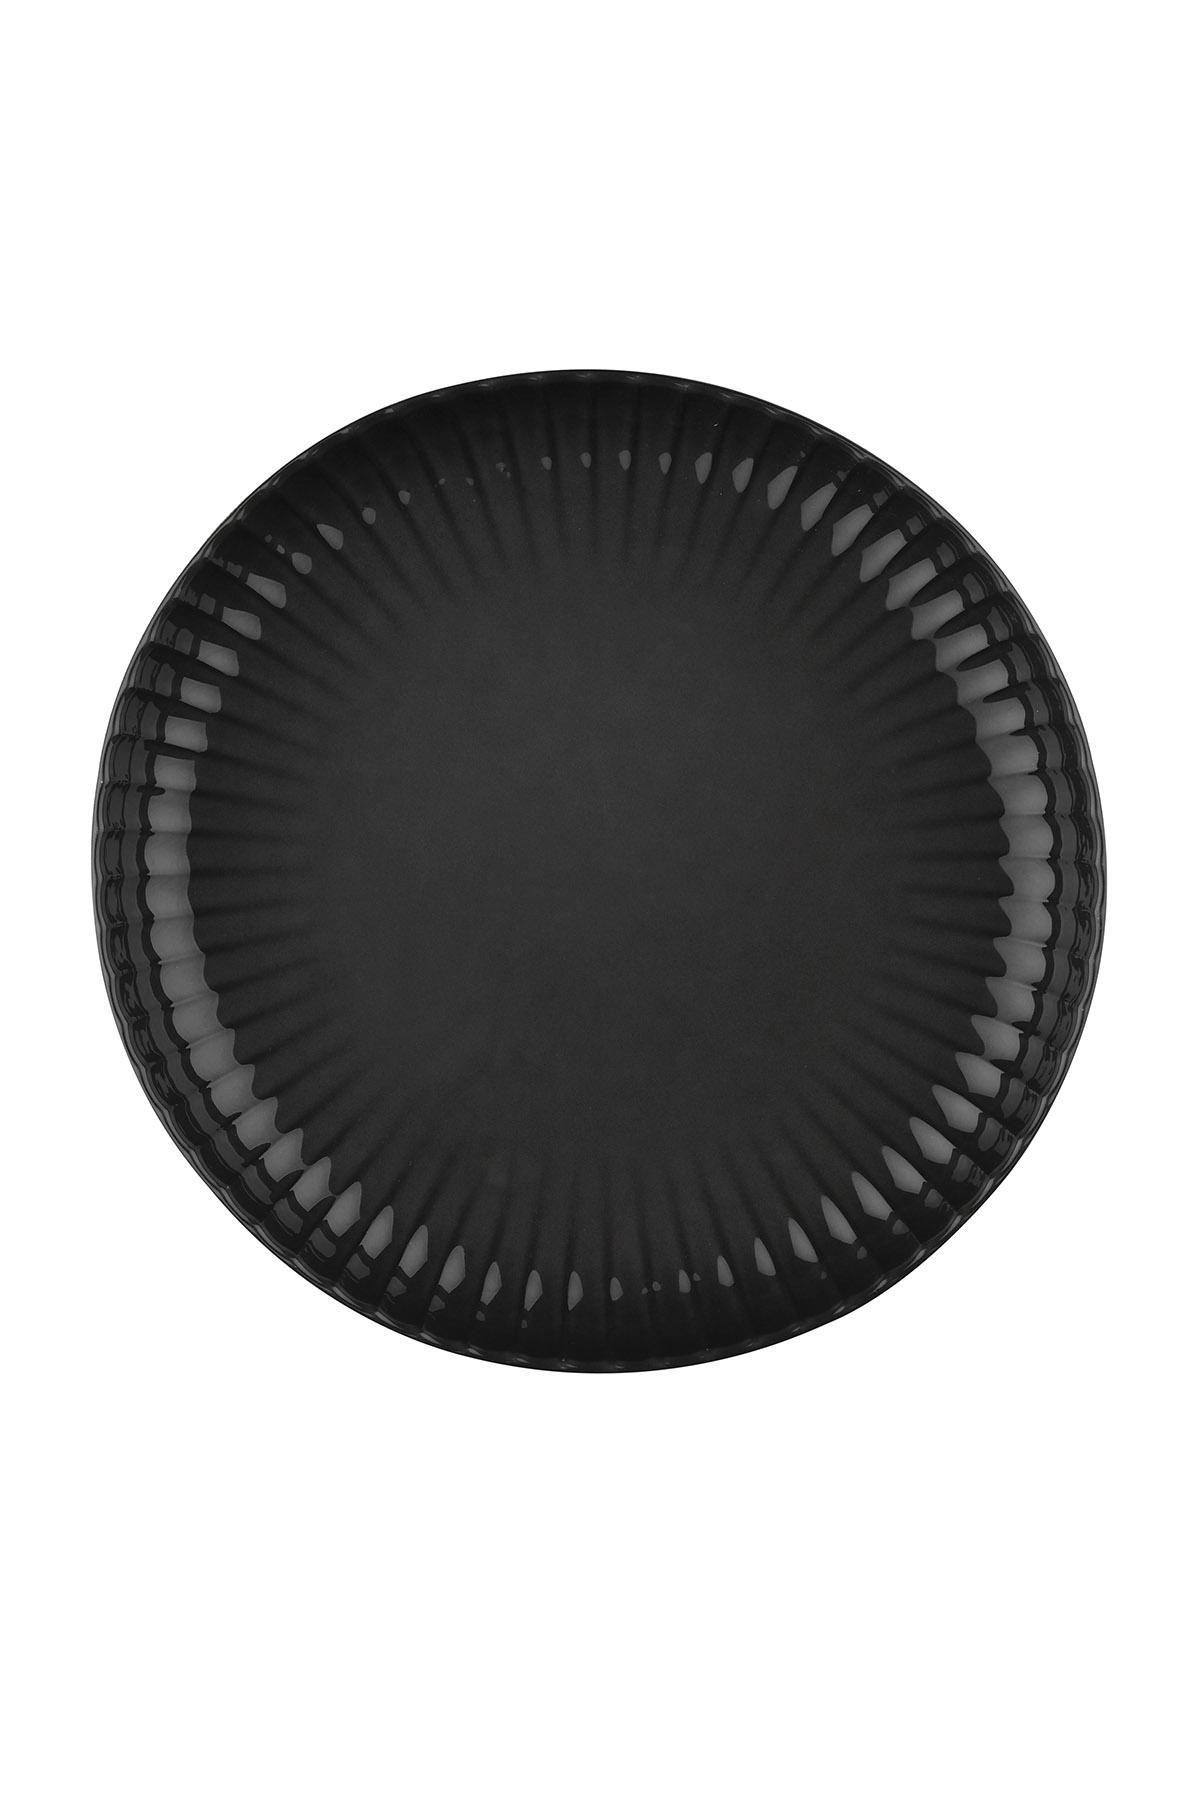 Kütahya Porselen - Crest 20 cm Çukur Tabak Siyah